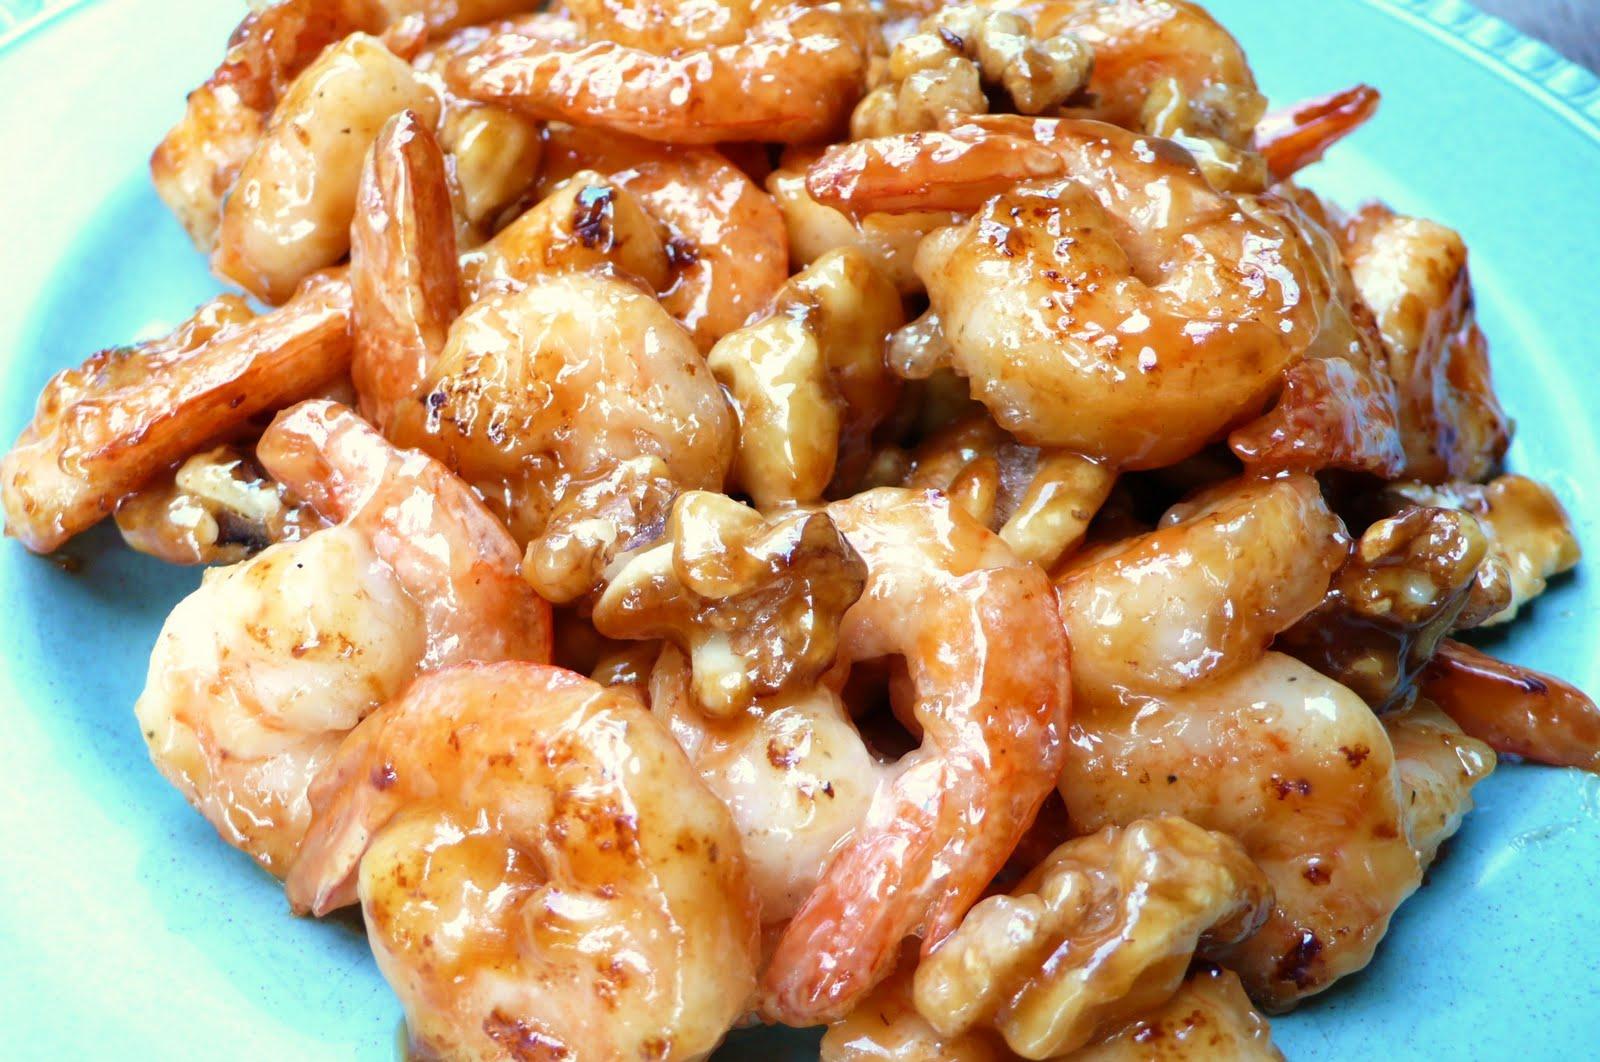 Honey Walnut Shrimp エビとクルミのハチミツソース | a ...